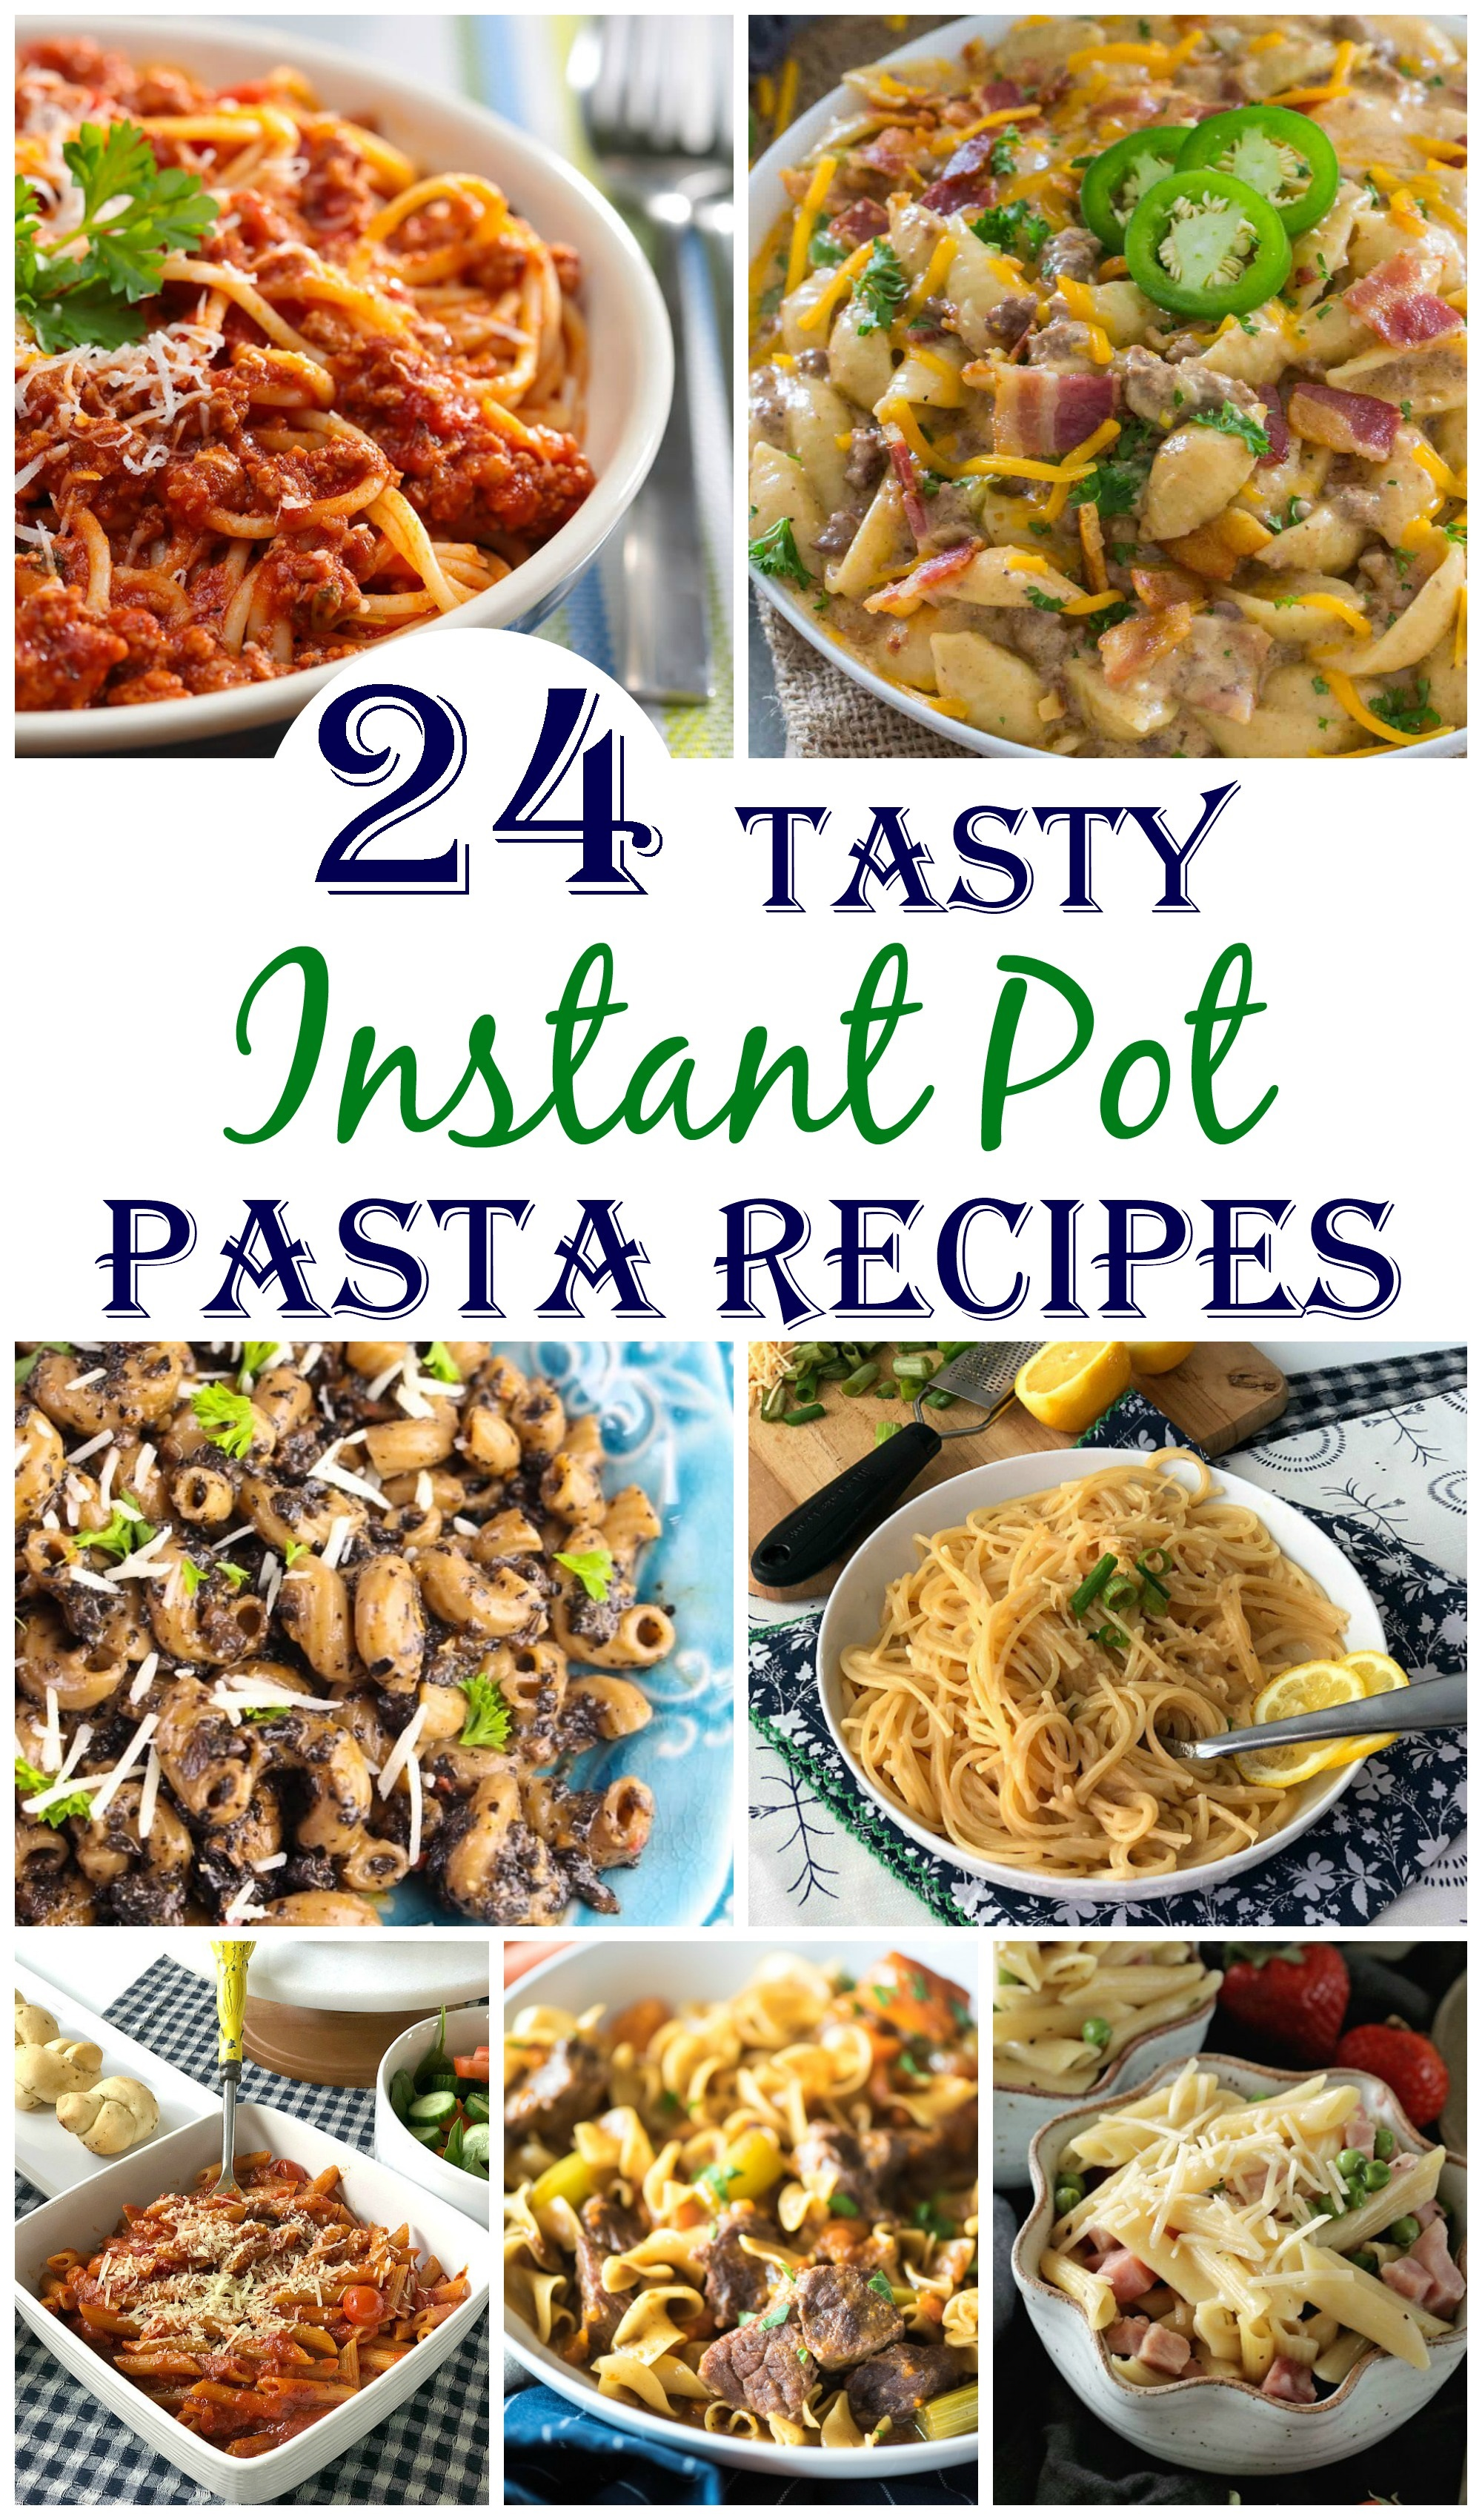 Instant Pot Pasta / Instant Pot Pasta Recipes / Instant Pot Spaghetti / Pasta in Instant Pot / #instantpot #pasta #pastarecipes  via @clarkscondensed